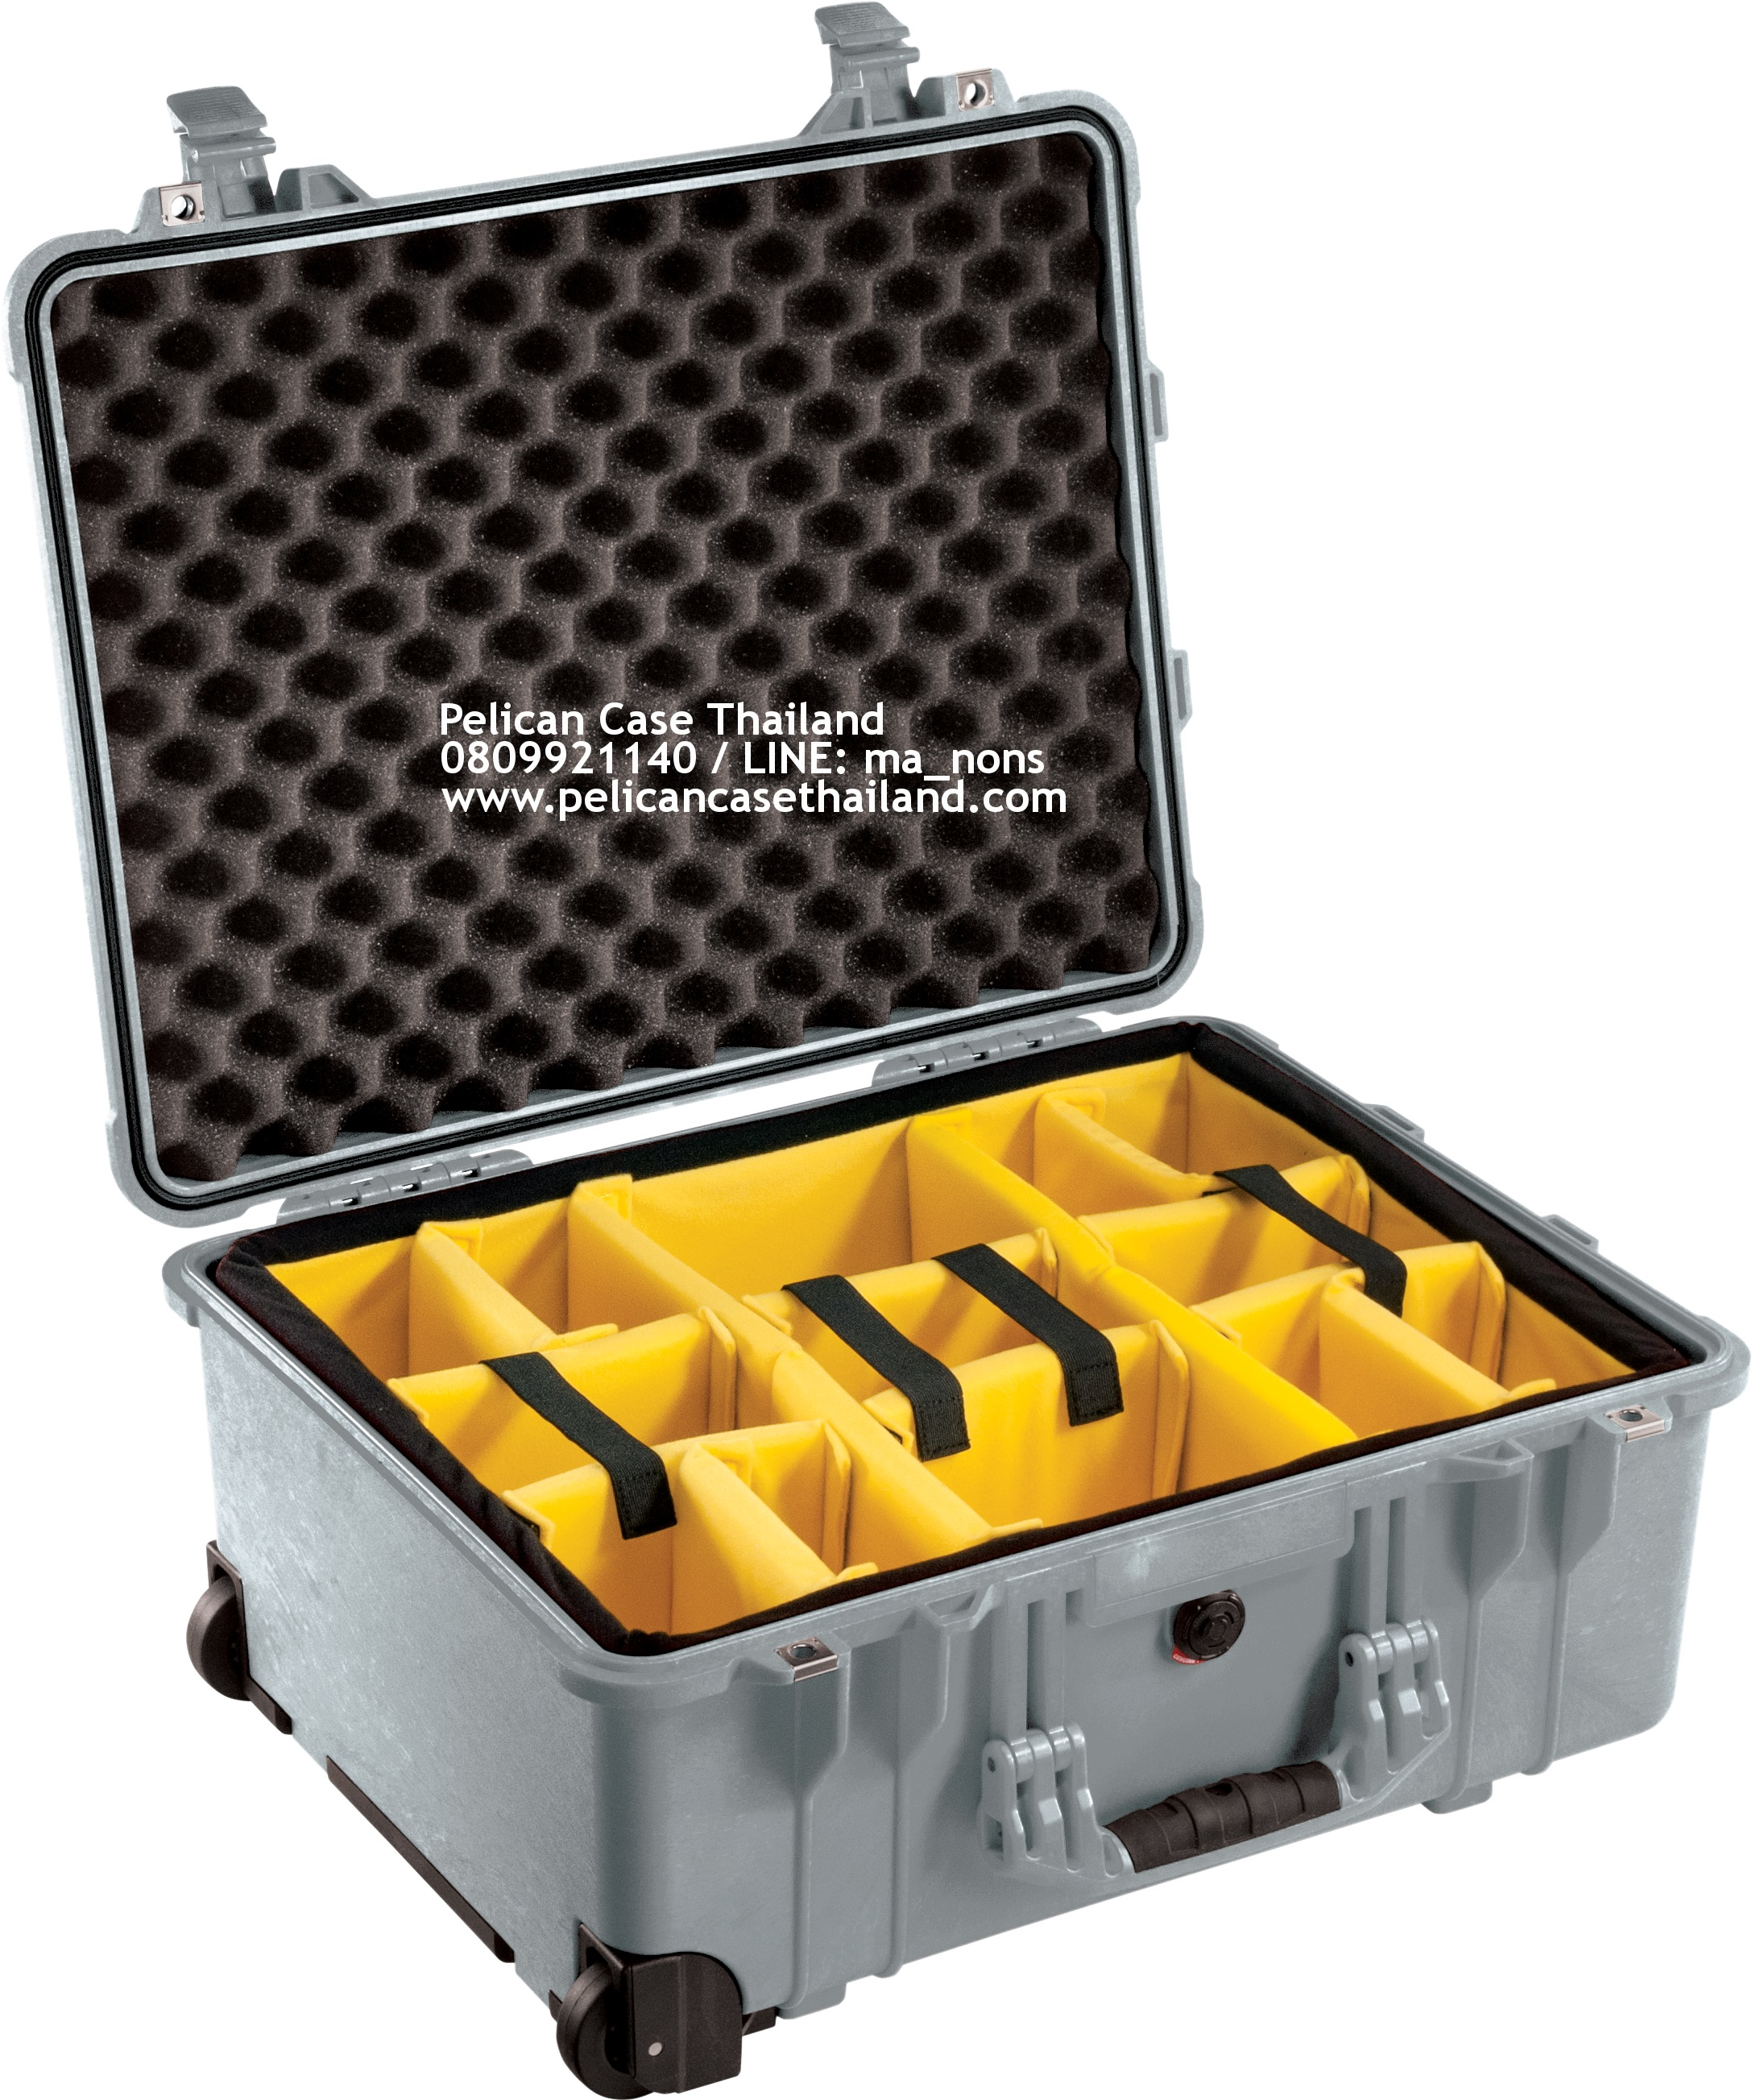 PELICAN™ 1560 with Padded Divider, Sliver (ช่องเเท้จากโรงงาน USA)